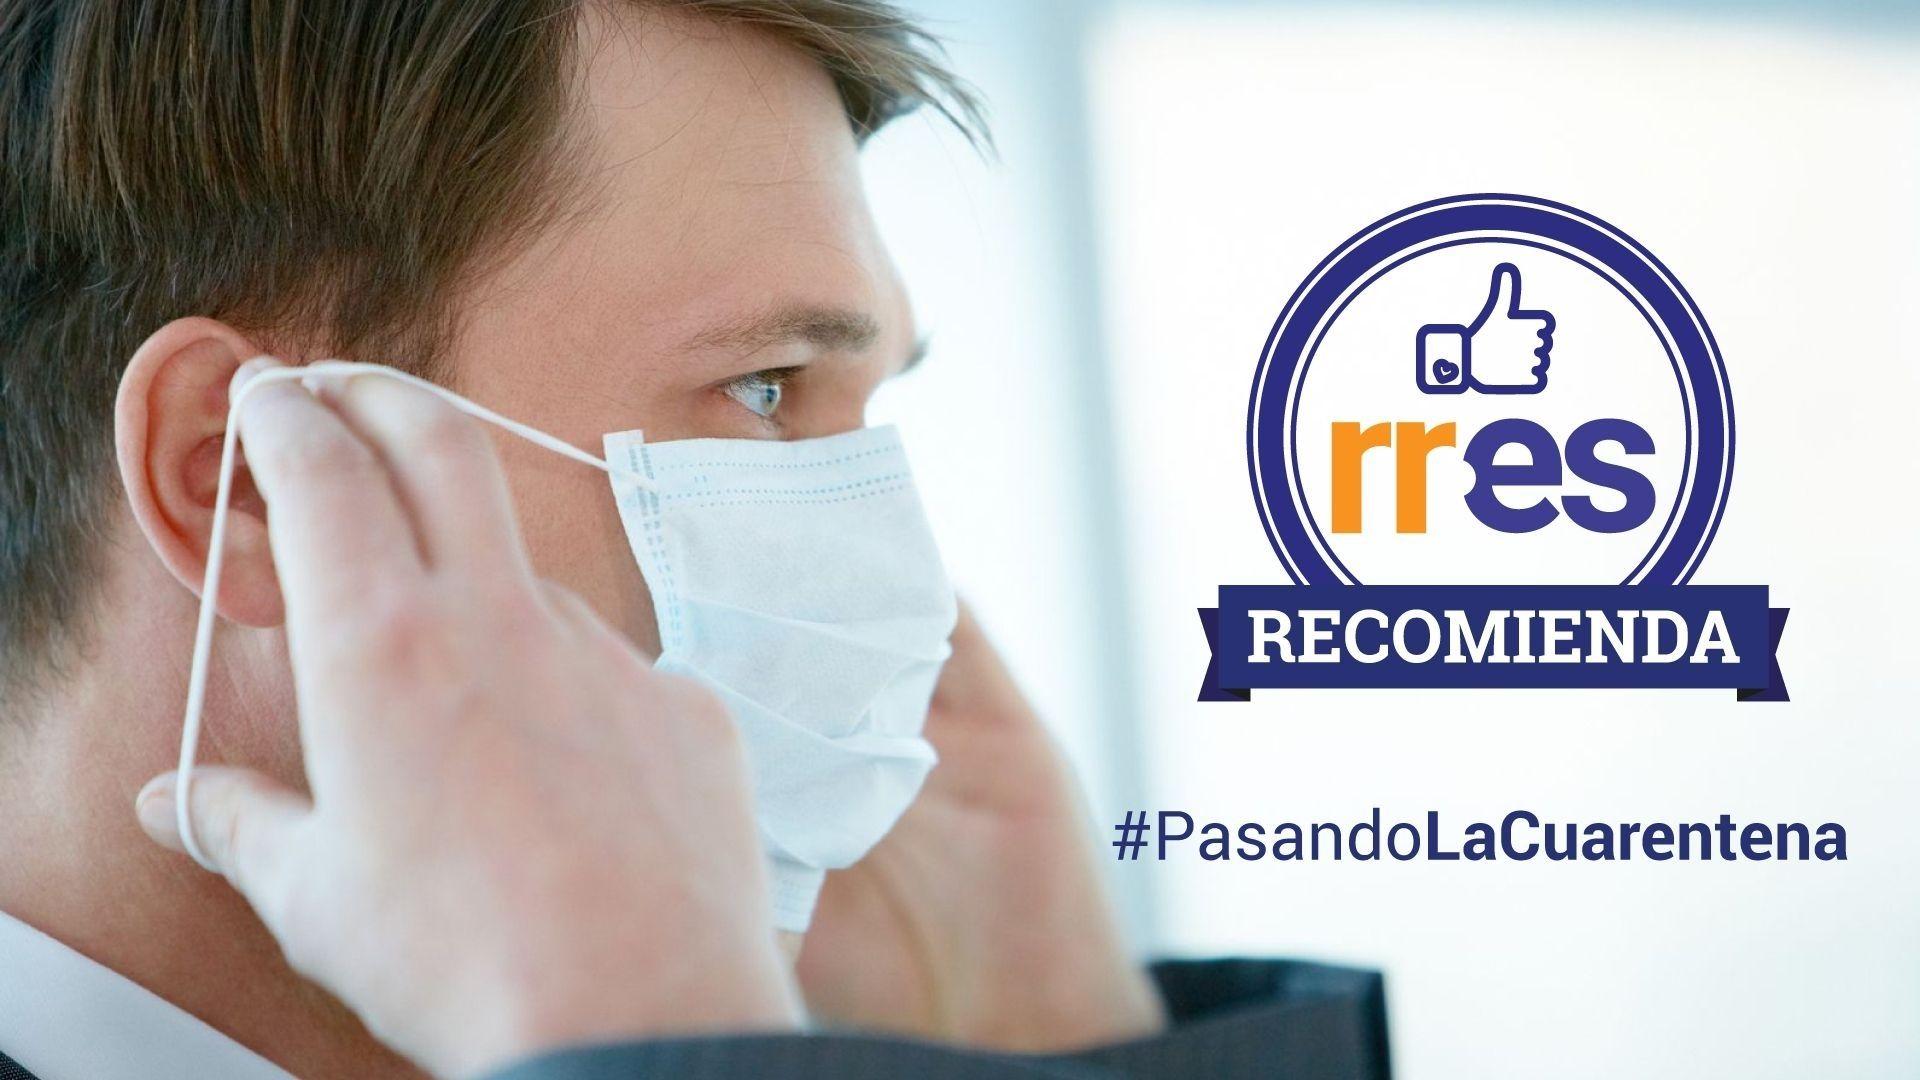 #PasandoLaCuarentena | Ejercicios físicos y fisioterapia respiratoria para afectados por COVID-19